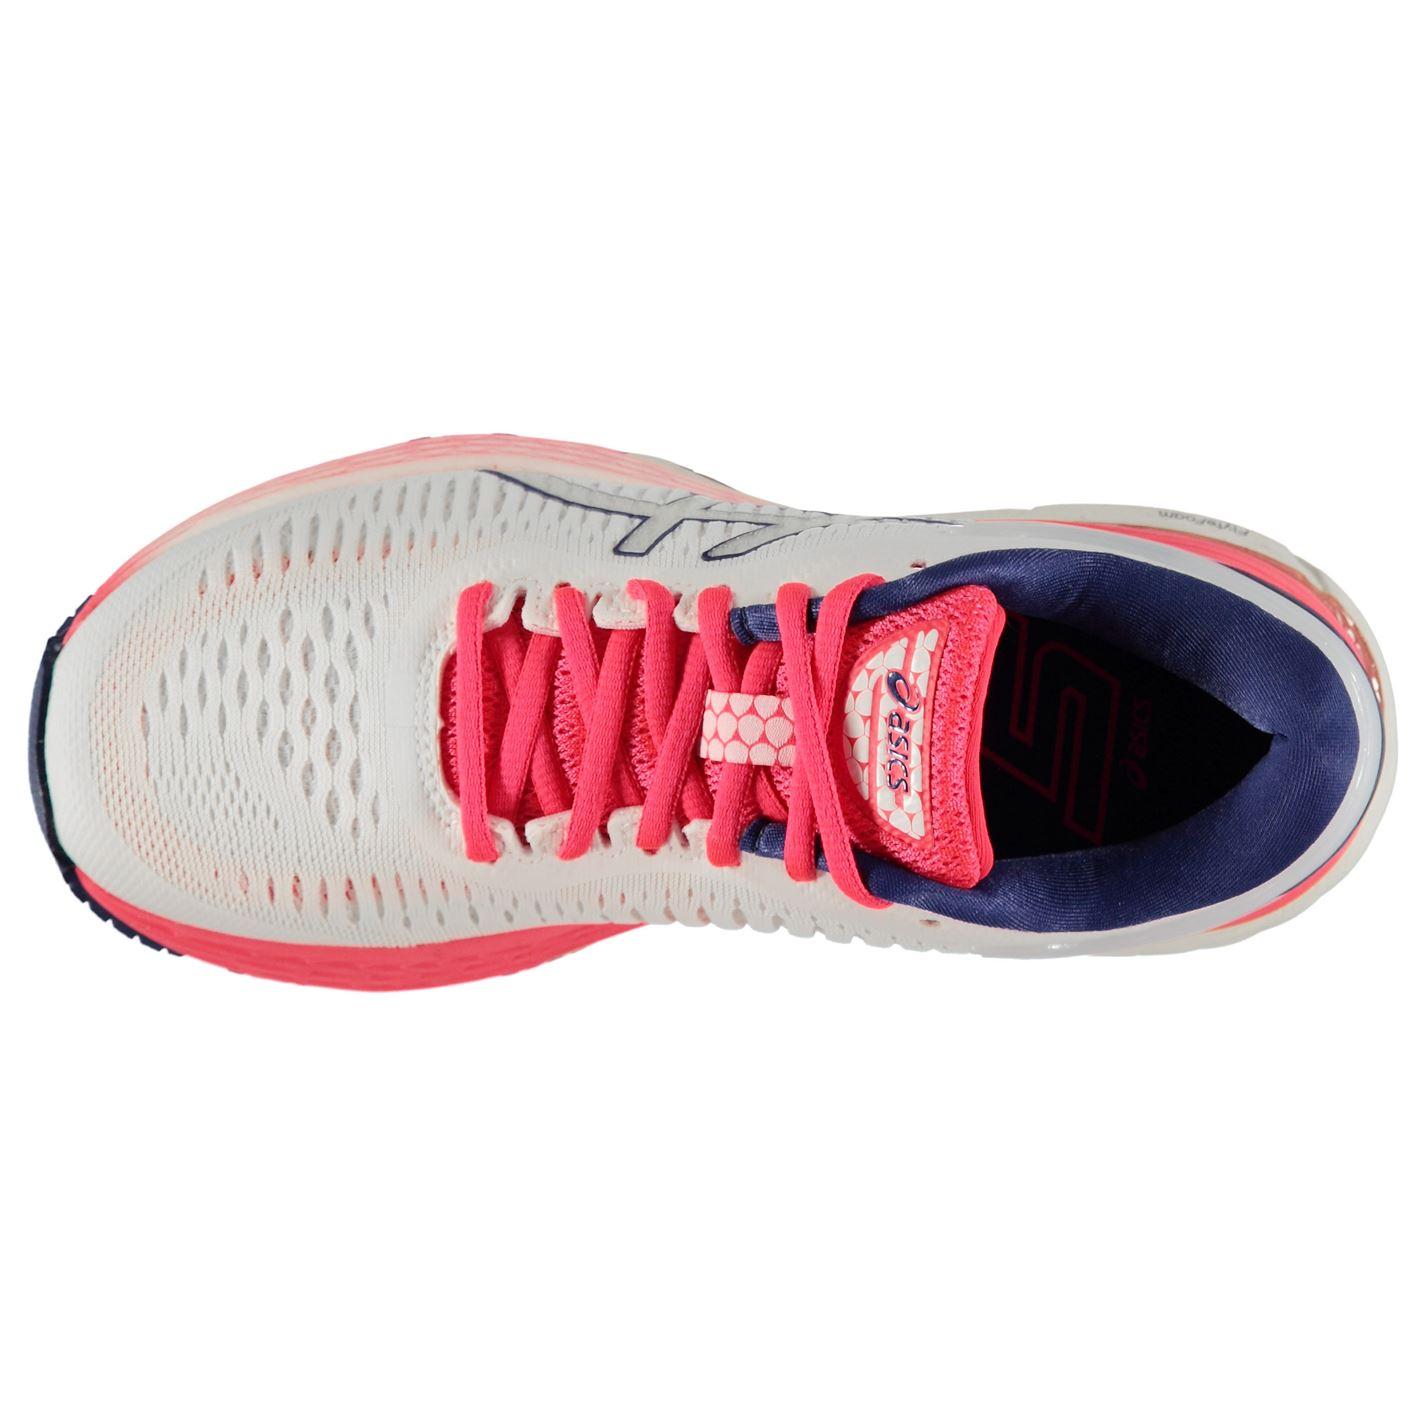 01a131035 Asics Womens Gel Kayano 25 Running Shoes Road Mesh Upper Platform | eBay